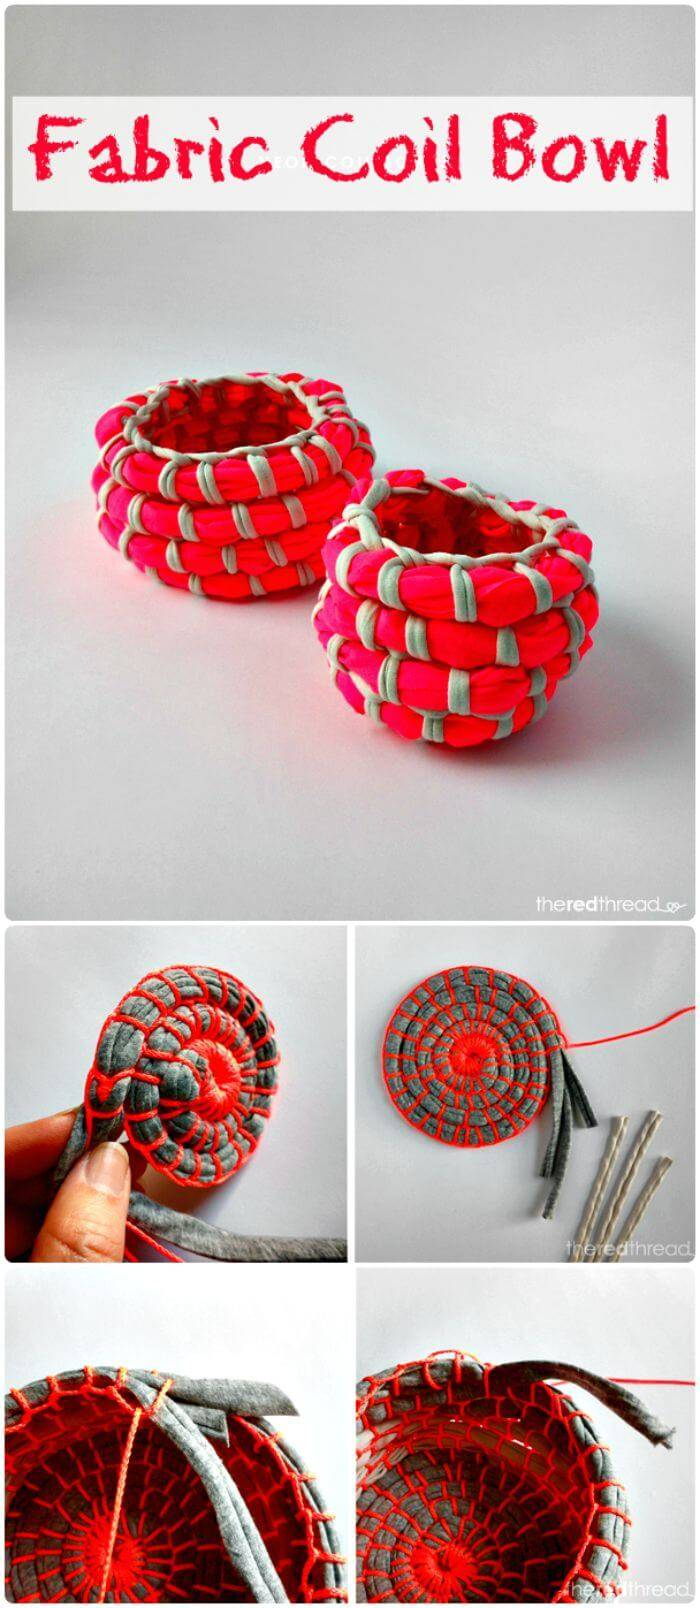 Make a Fabric Coil Bowl